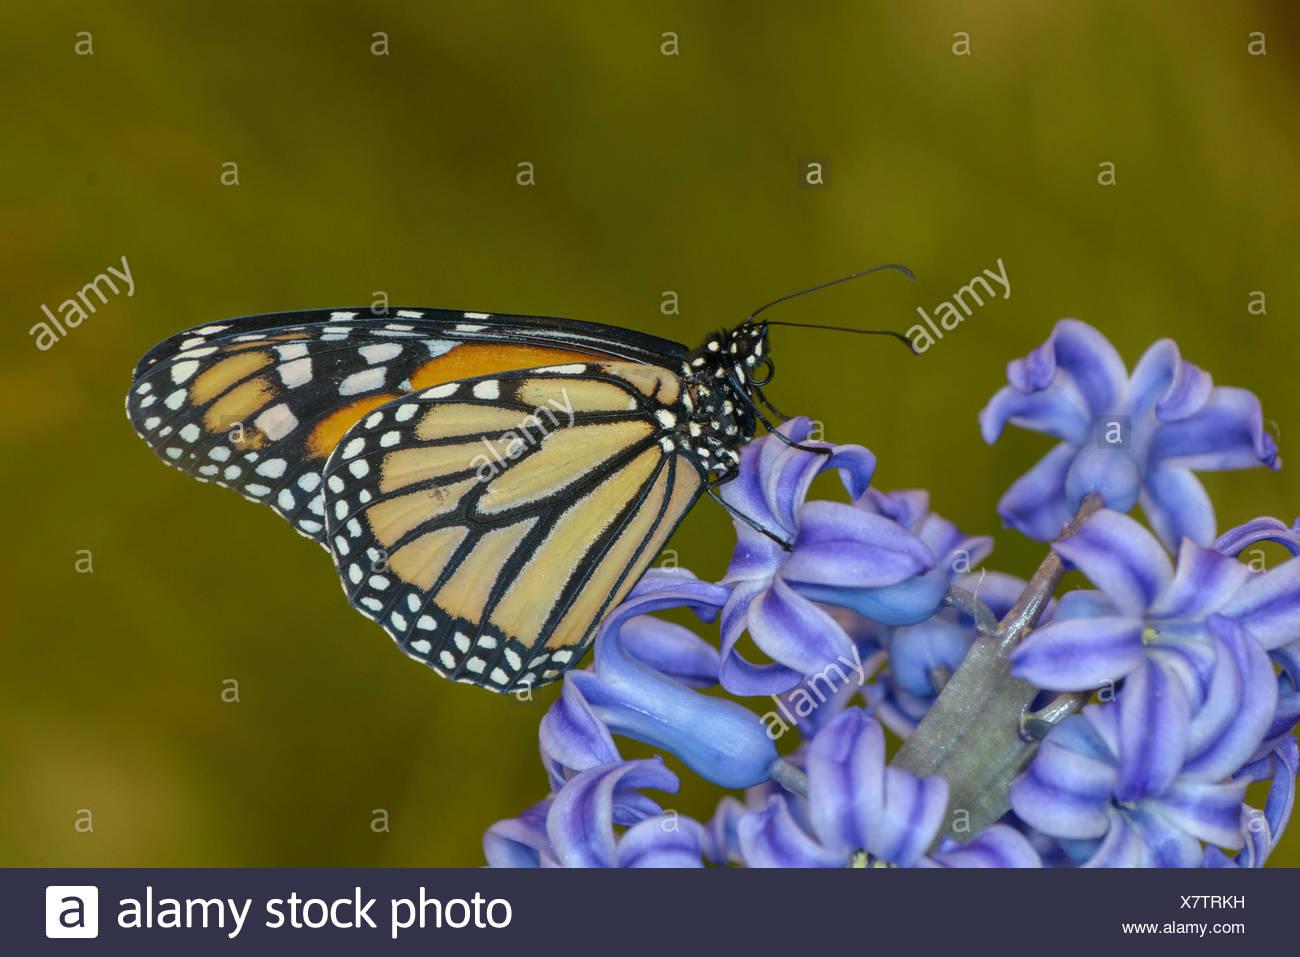 Monarch Butterfly, Danaus plexippus, on hyacinth blossom - Stock Image